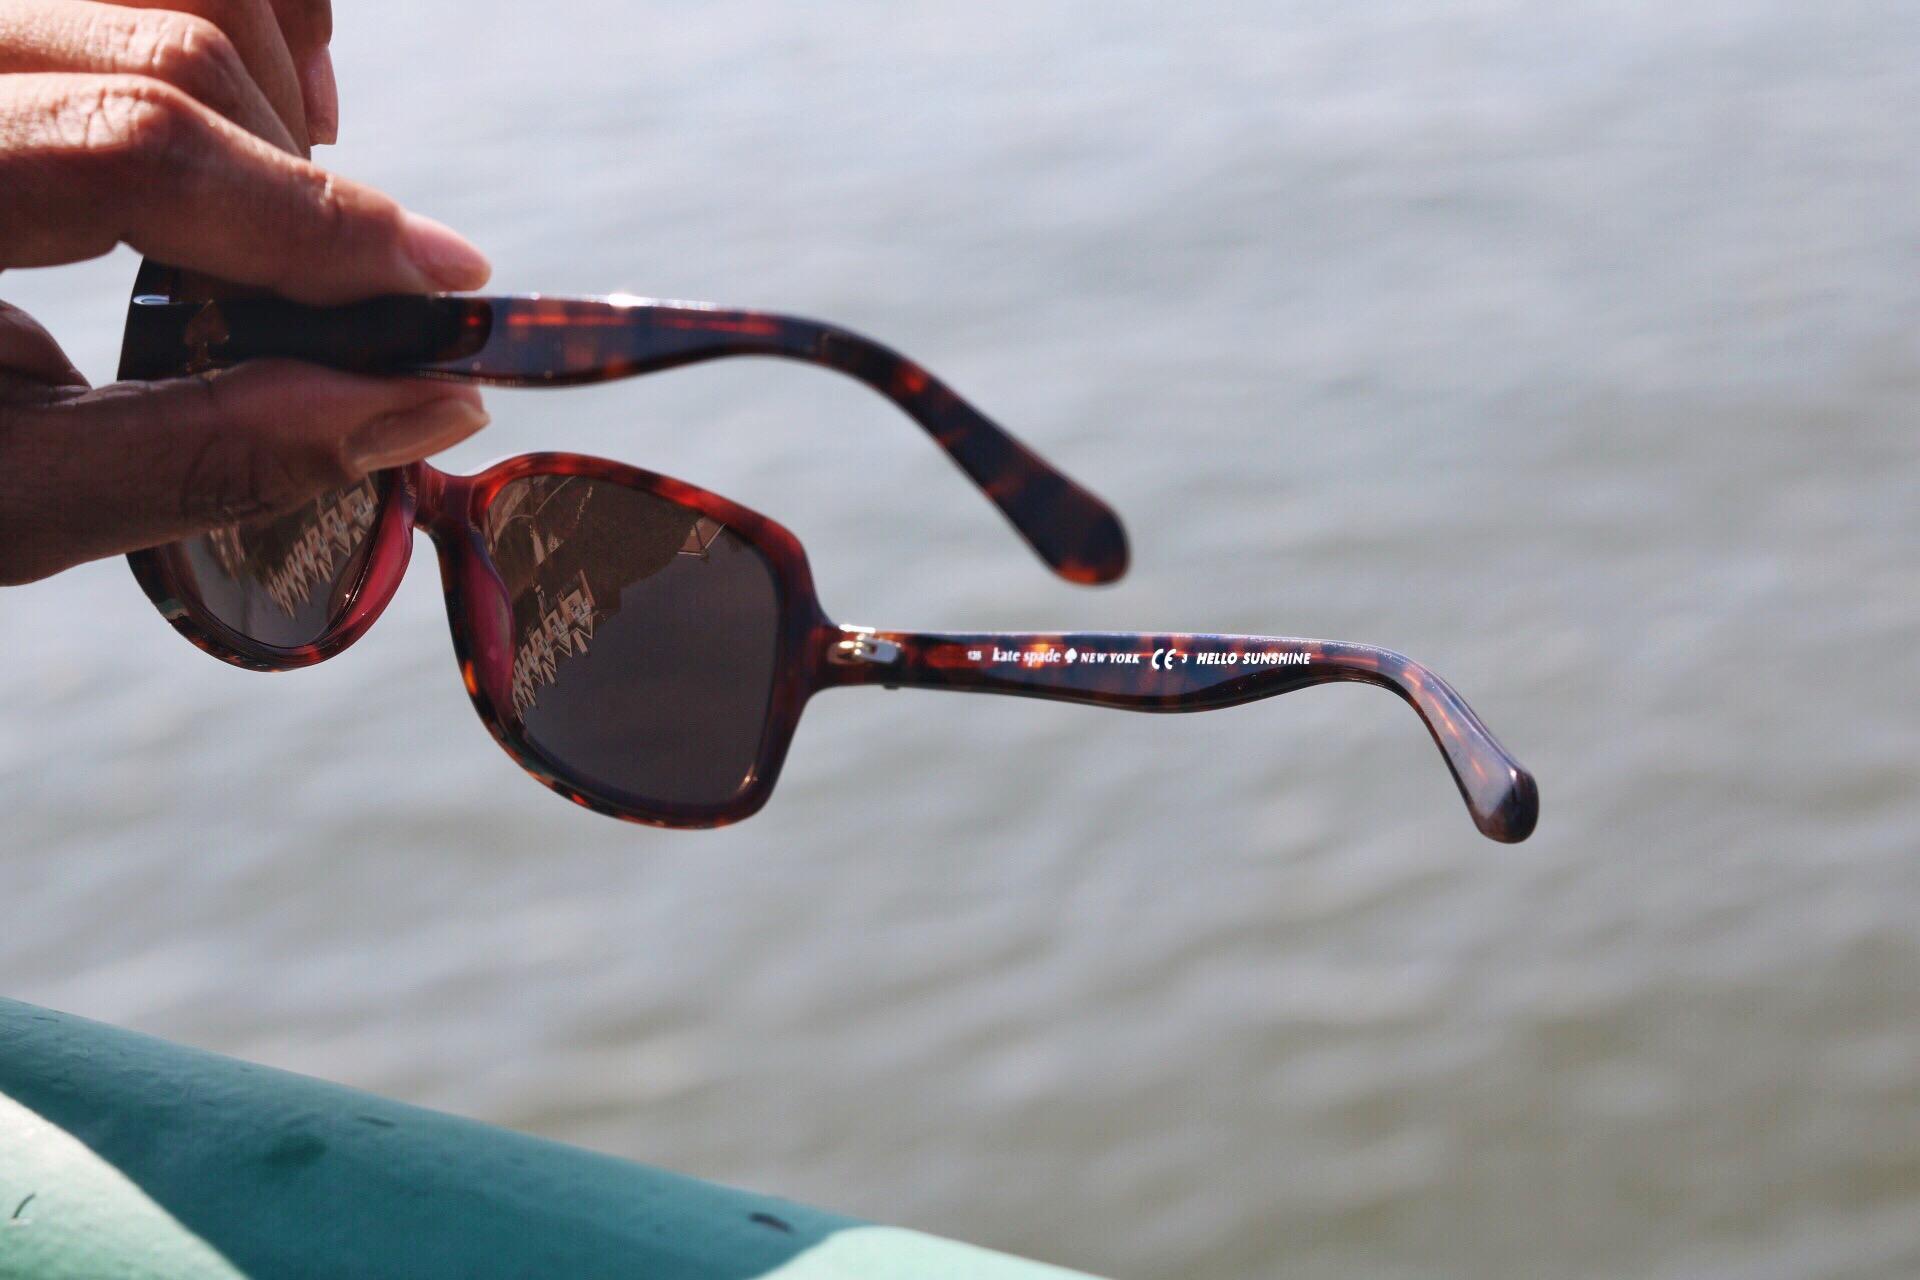 This Season's Gold // Kate Spade Hello Sunshine sunglasses